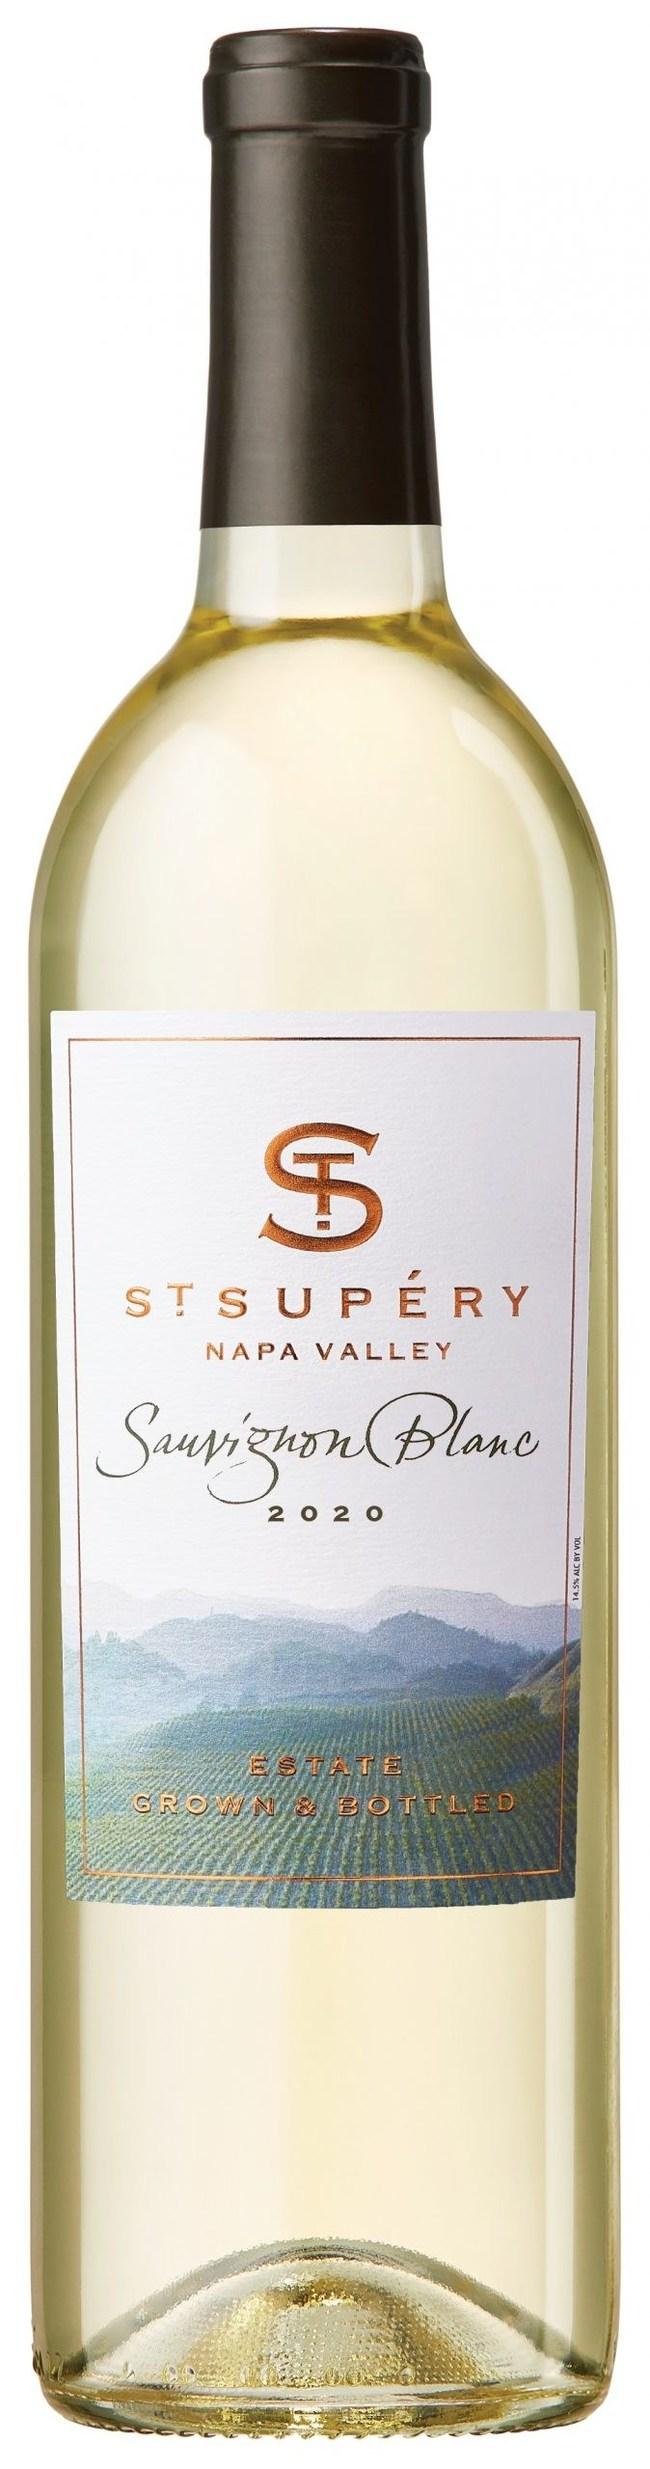 2020 St. Supéry Napa Valley Estate Sauvignon Blanc